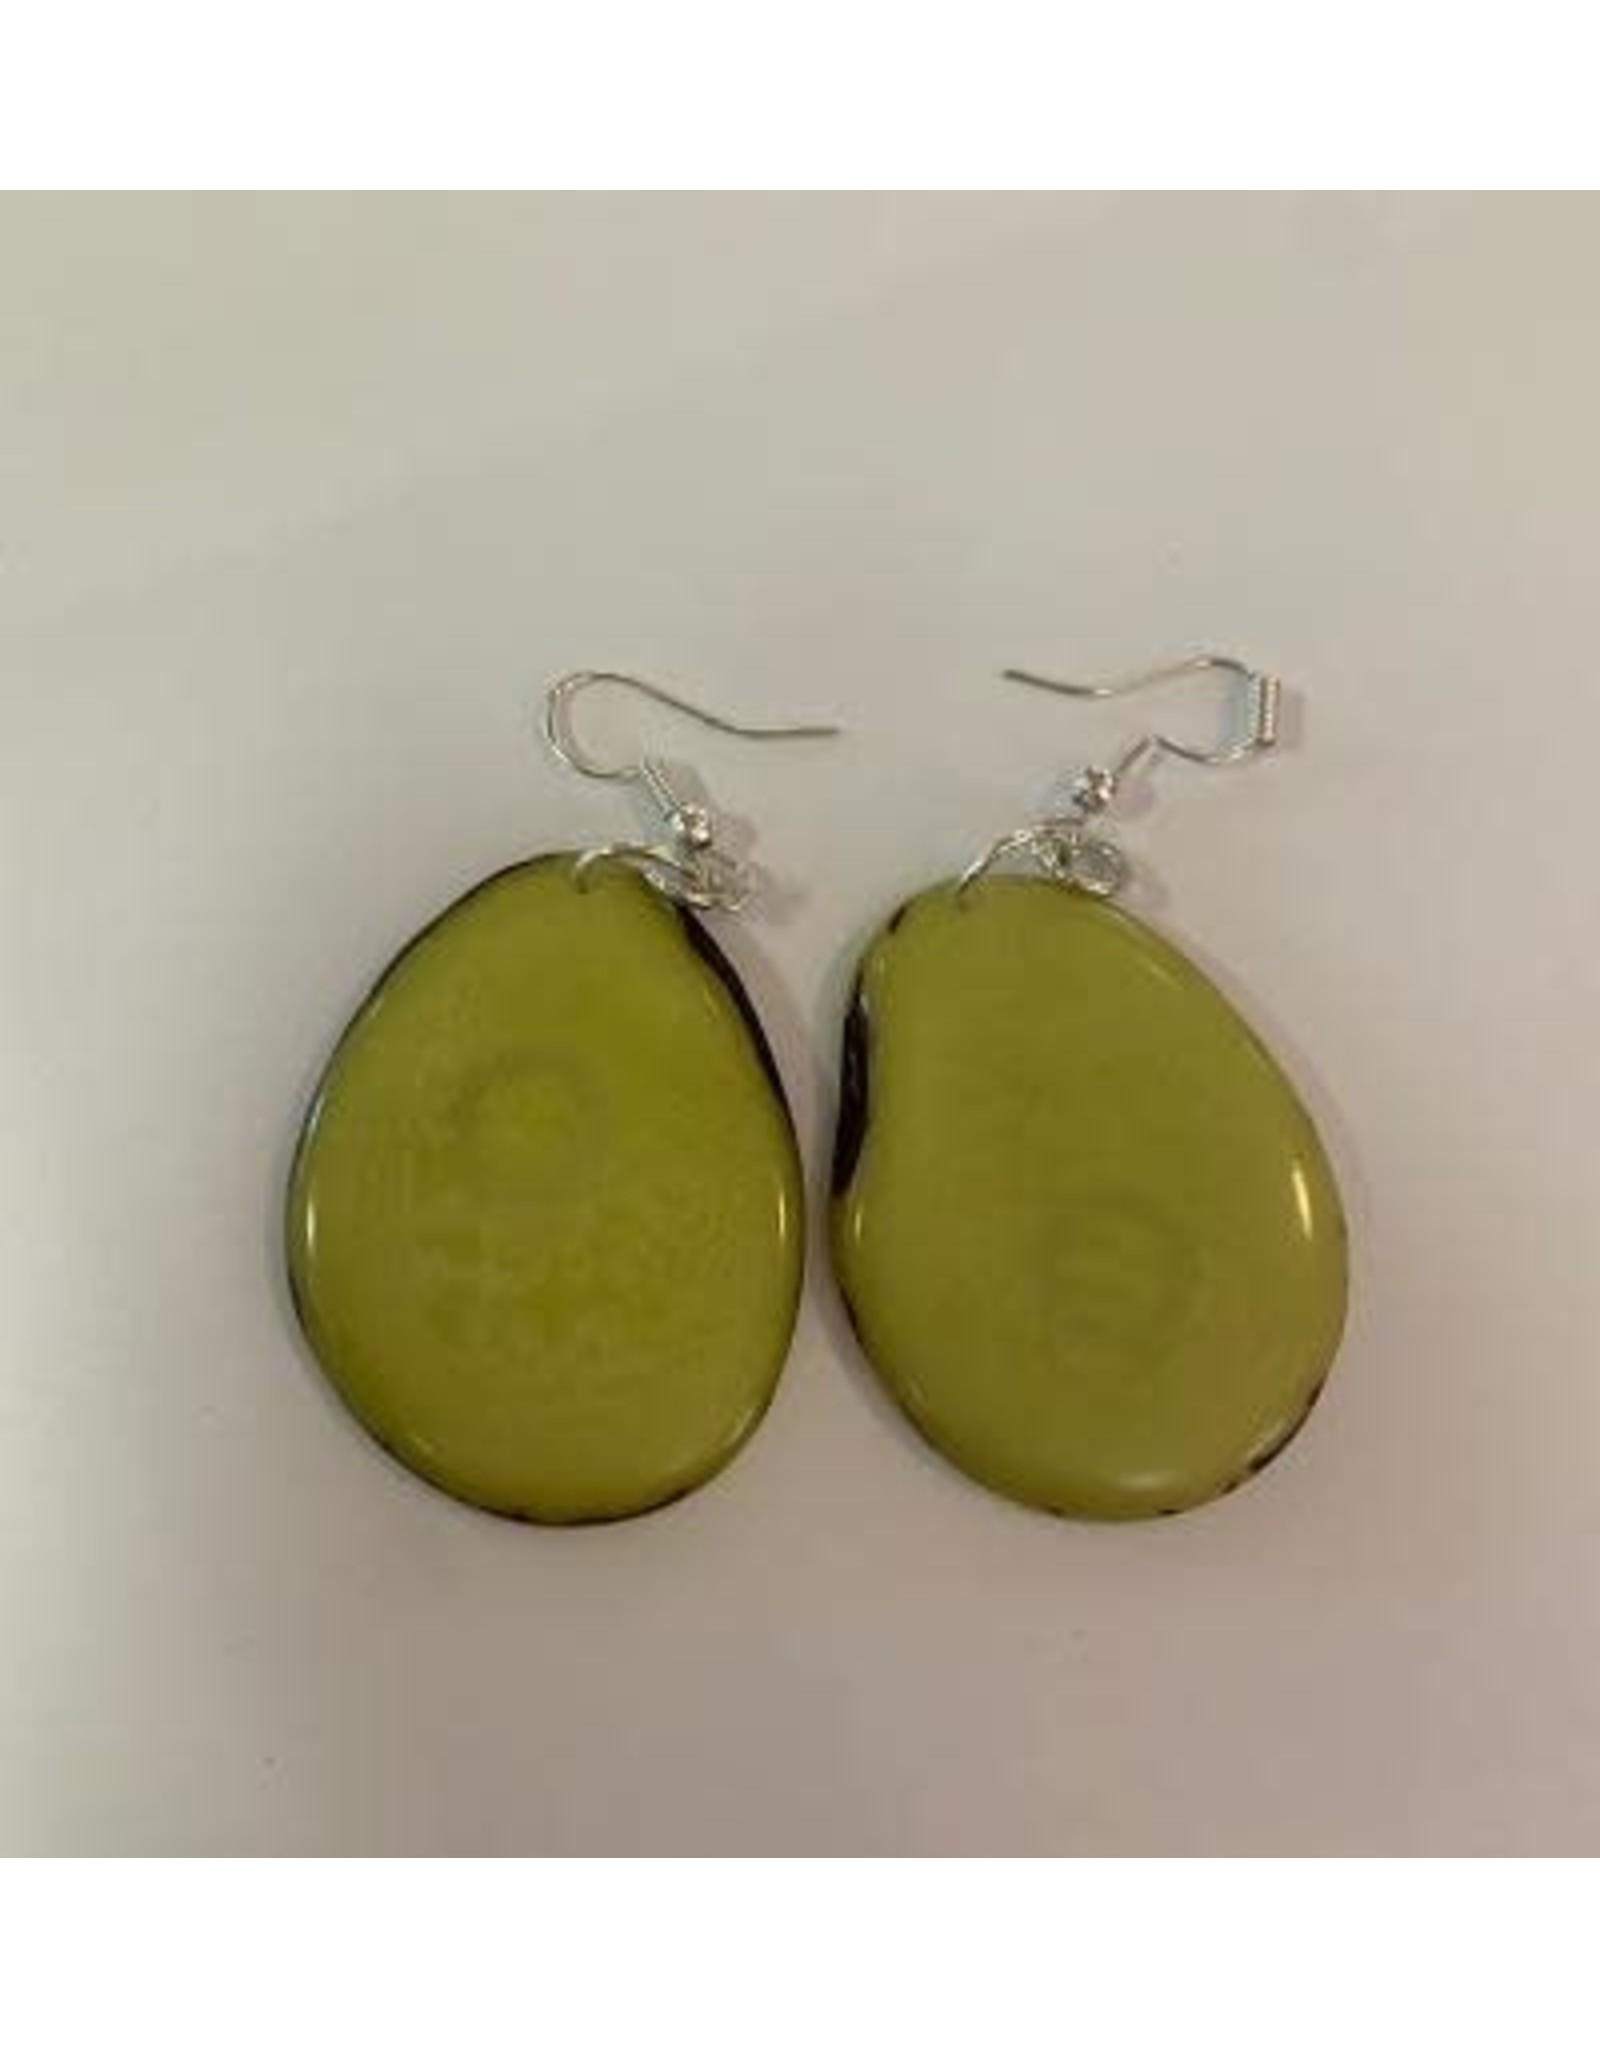 Tagua Fashion Earrings, Solid Lime Green, Ecuador